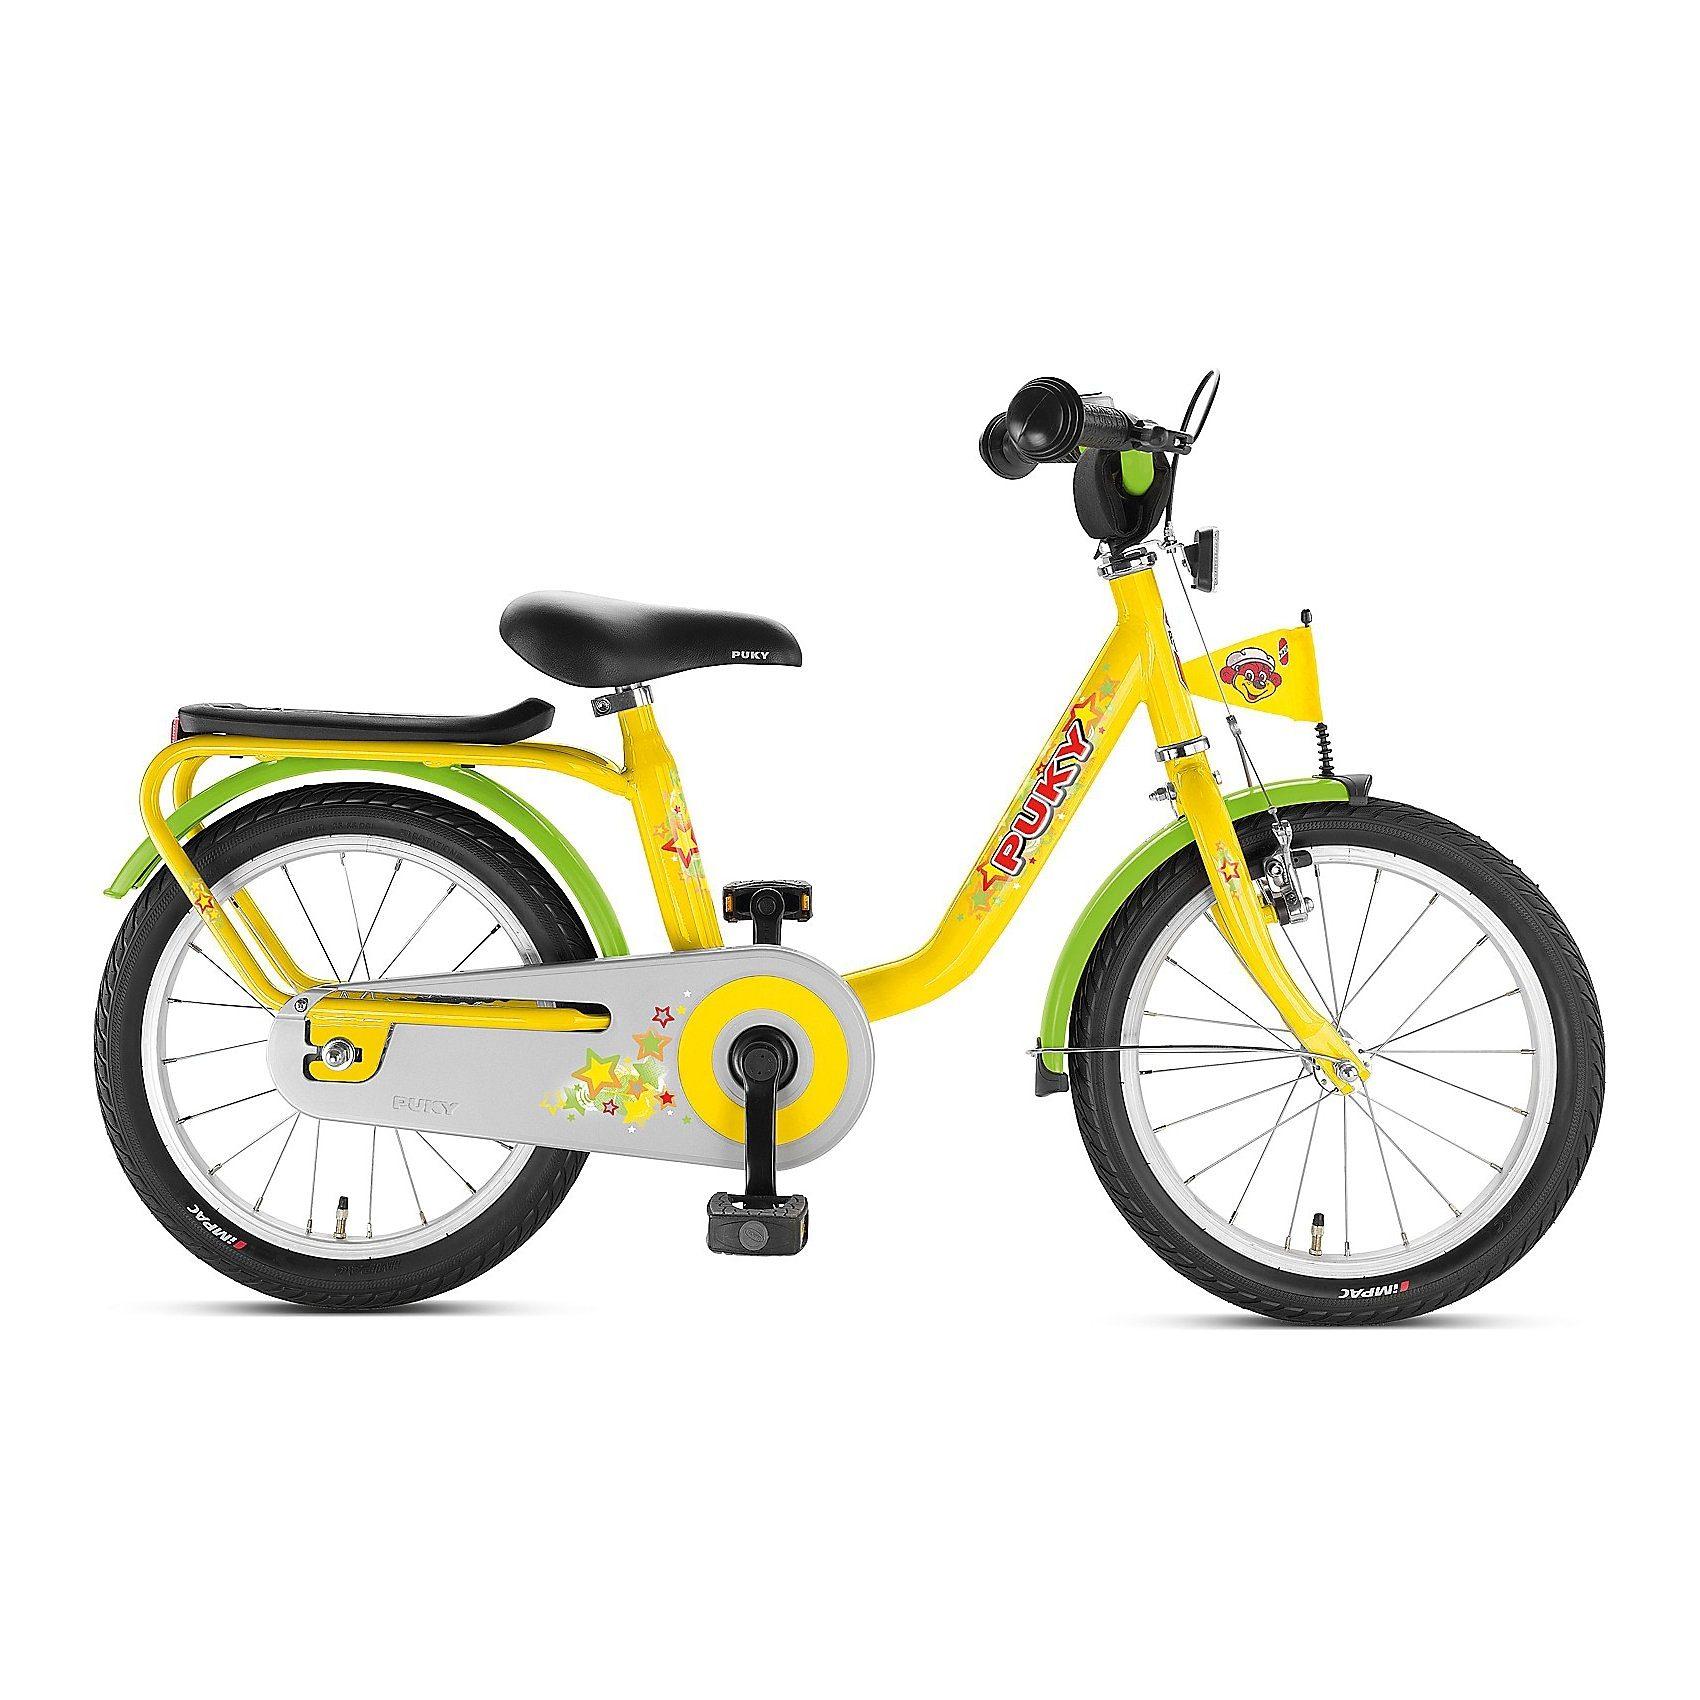 PUKY Fahrrad Z 6, 16 Zoll, gelb